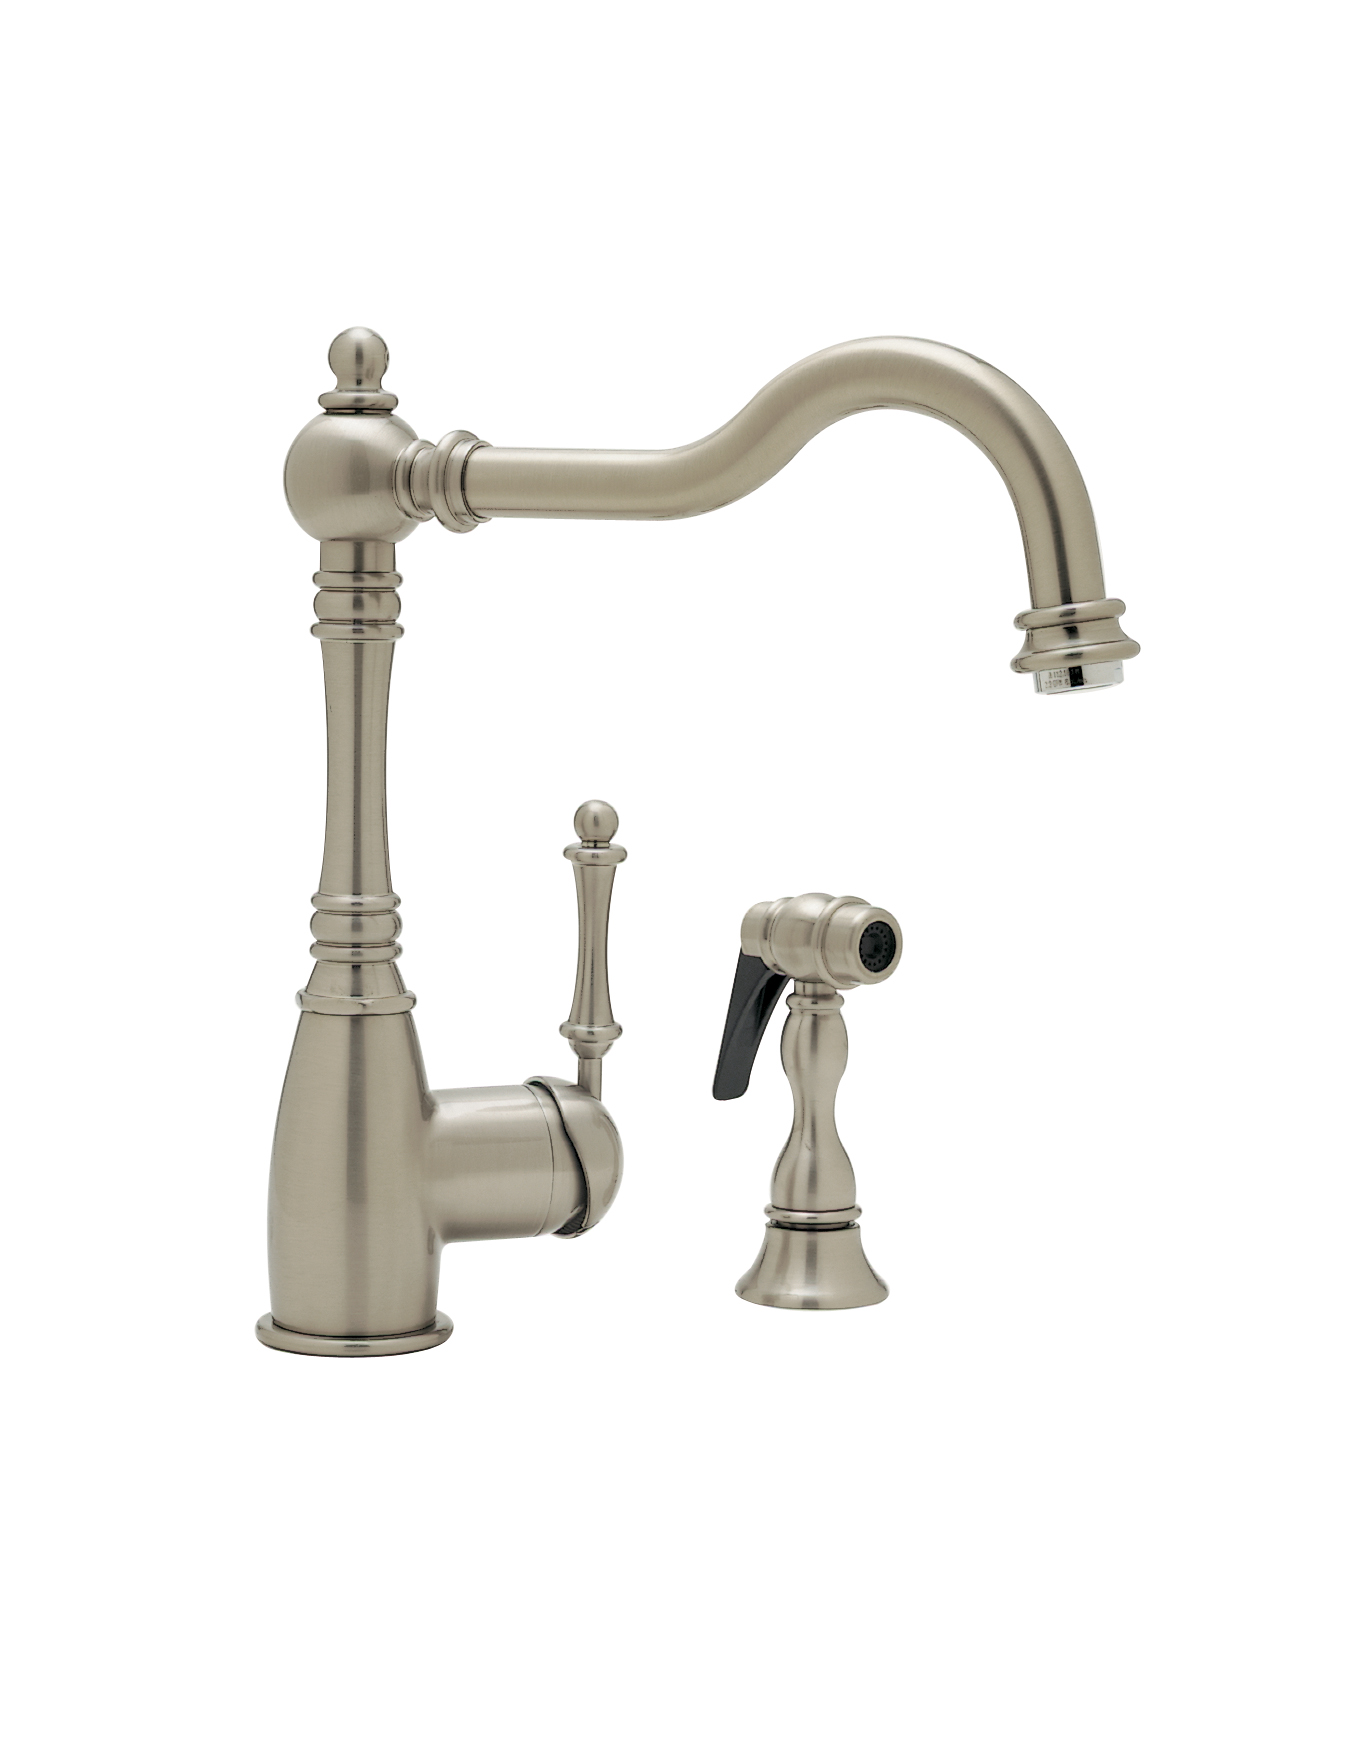 Blanco Faucet Reviews : Grace w/Sidespray 1.8 Satin Nickel Colonial Marble & Granite